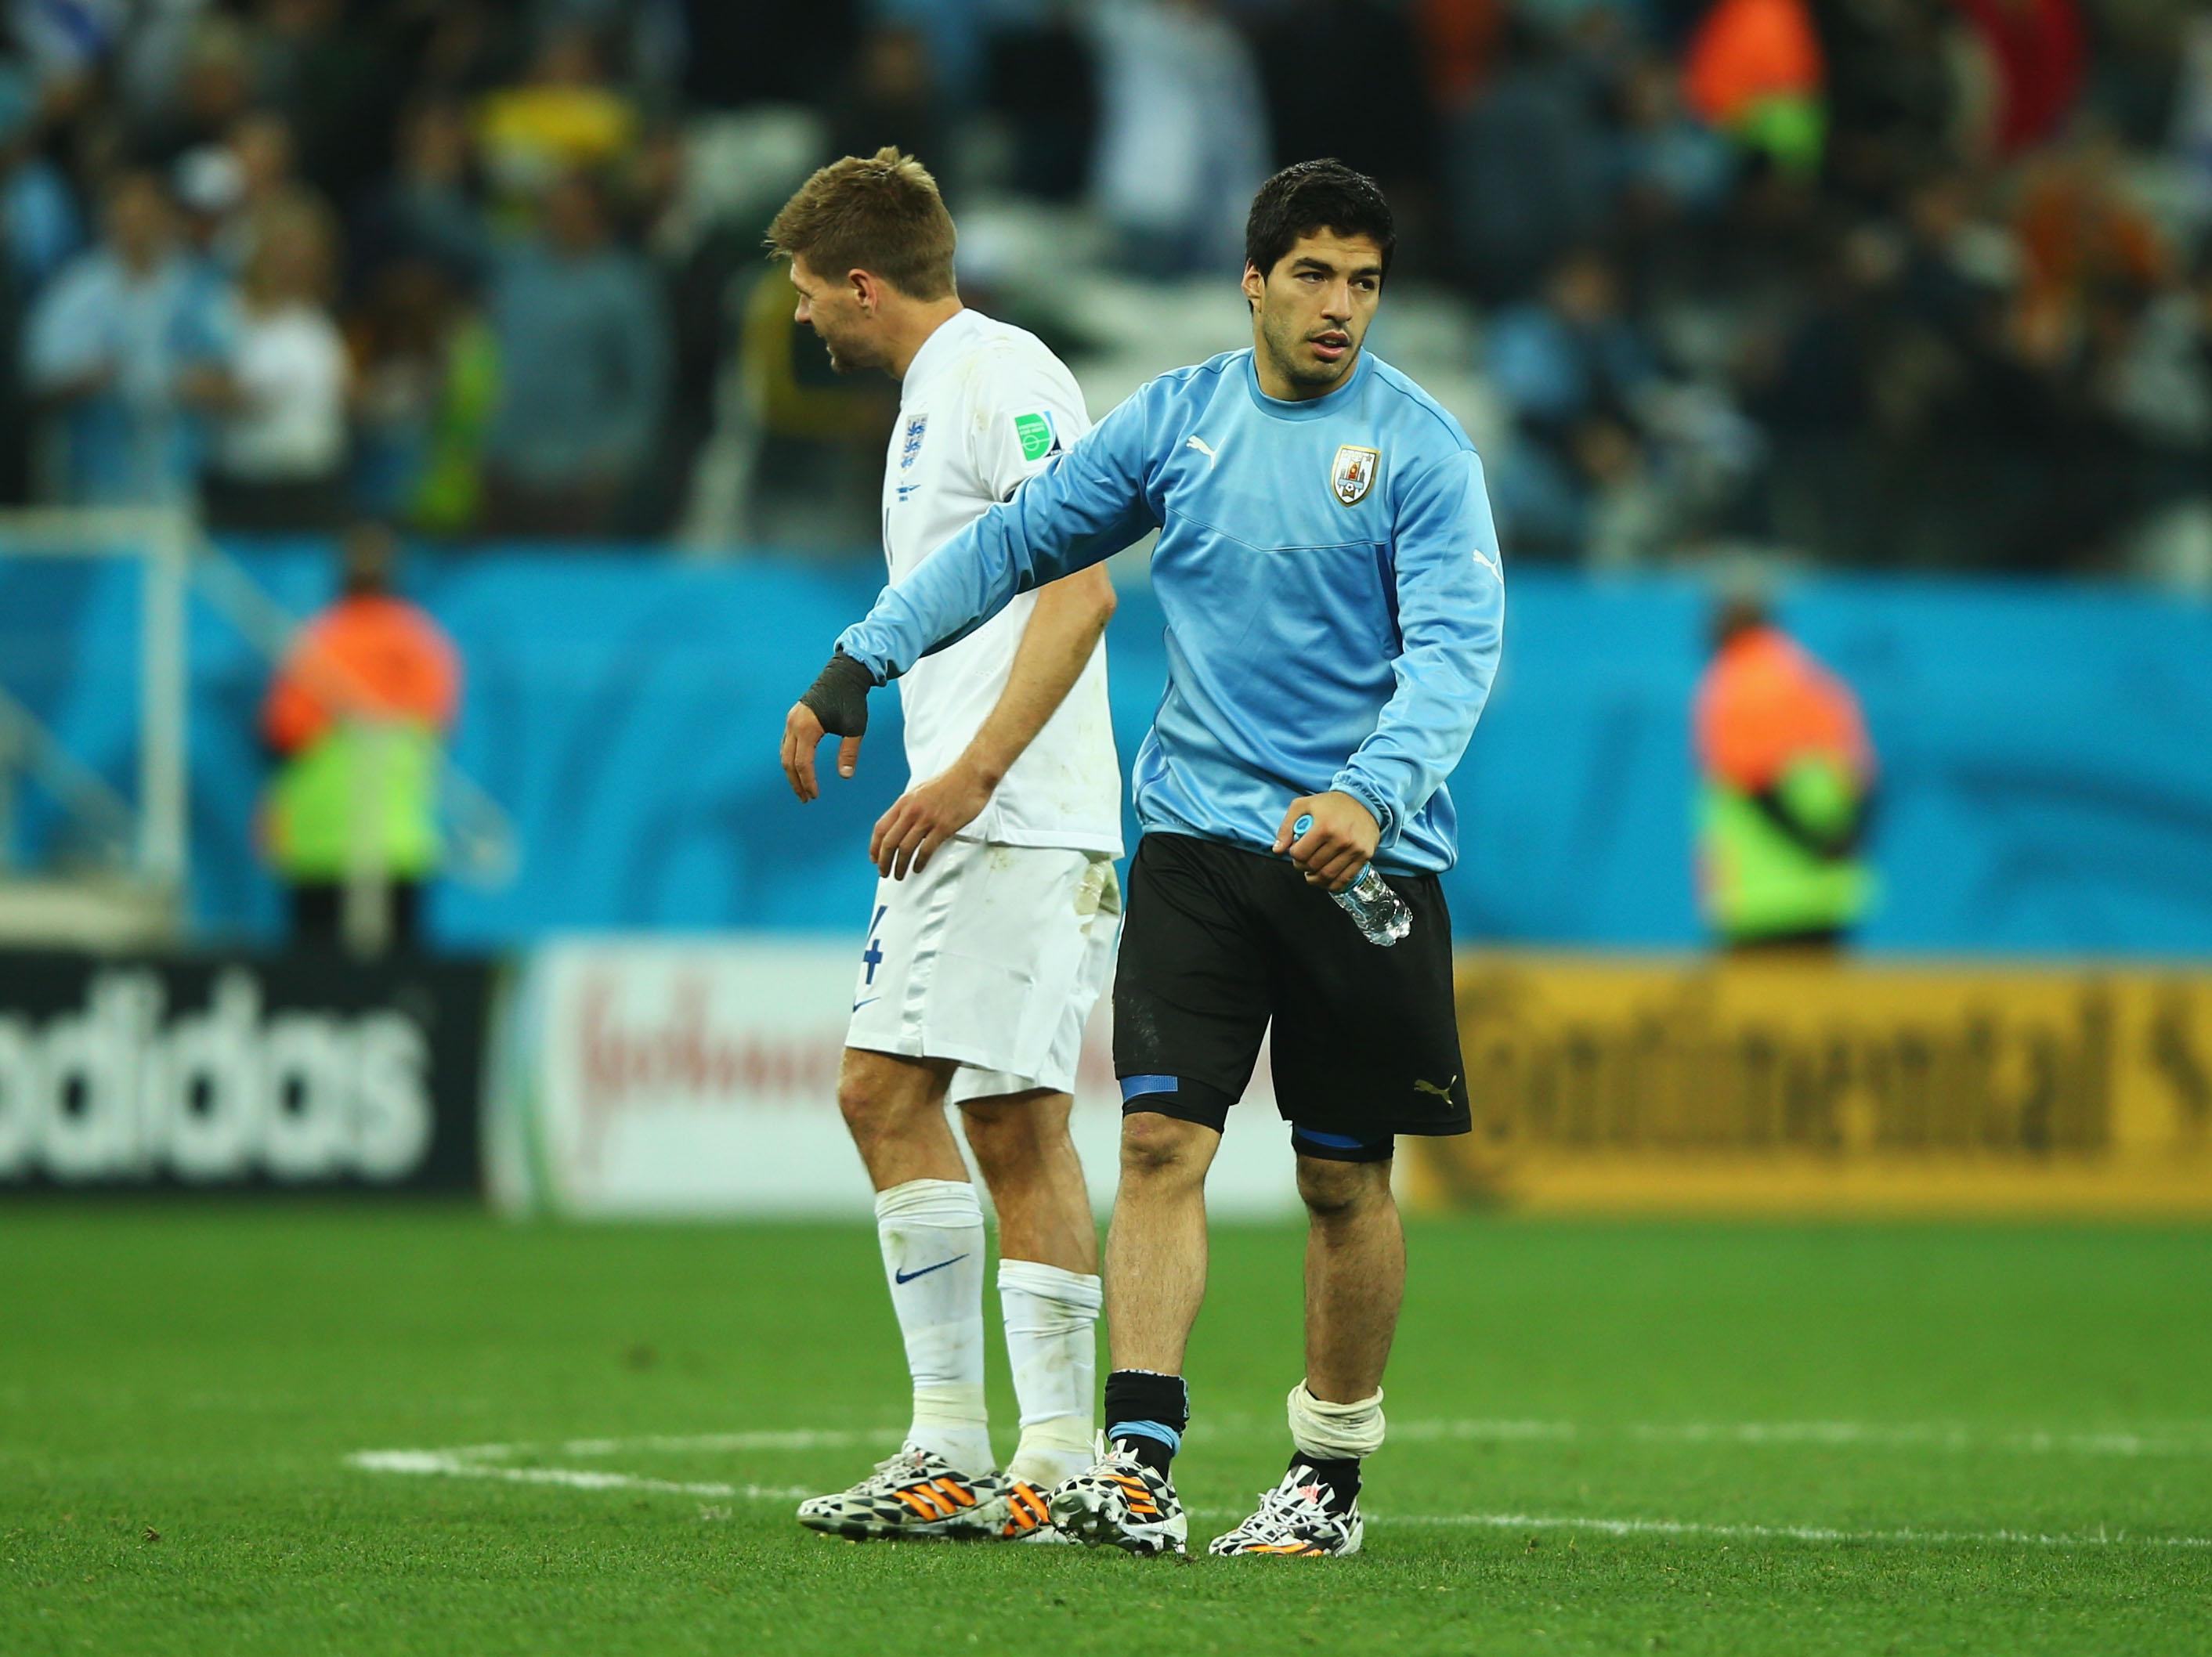 If Steven Gerrard returns to Liverpool he shouldn t be part of